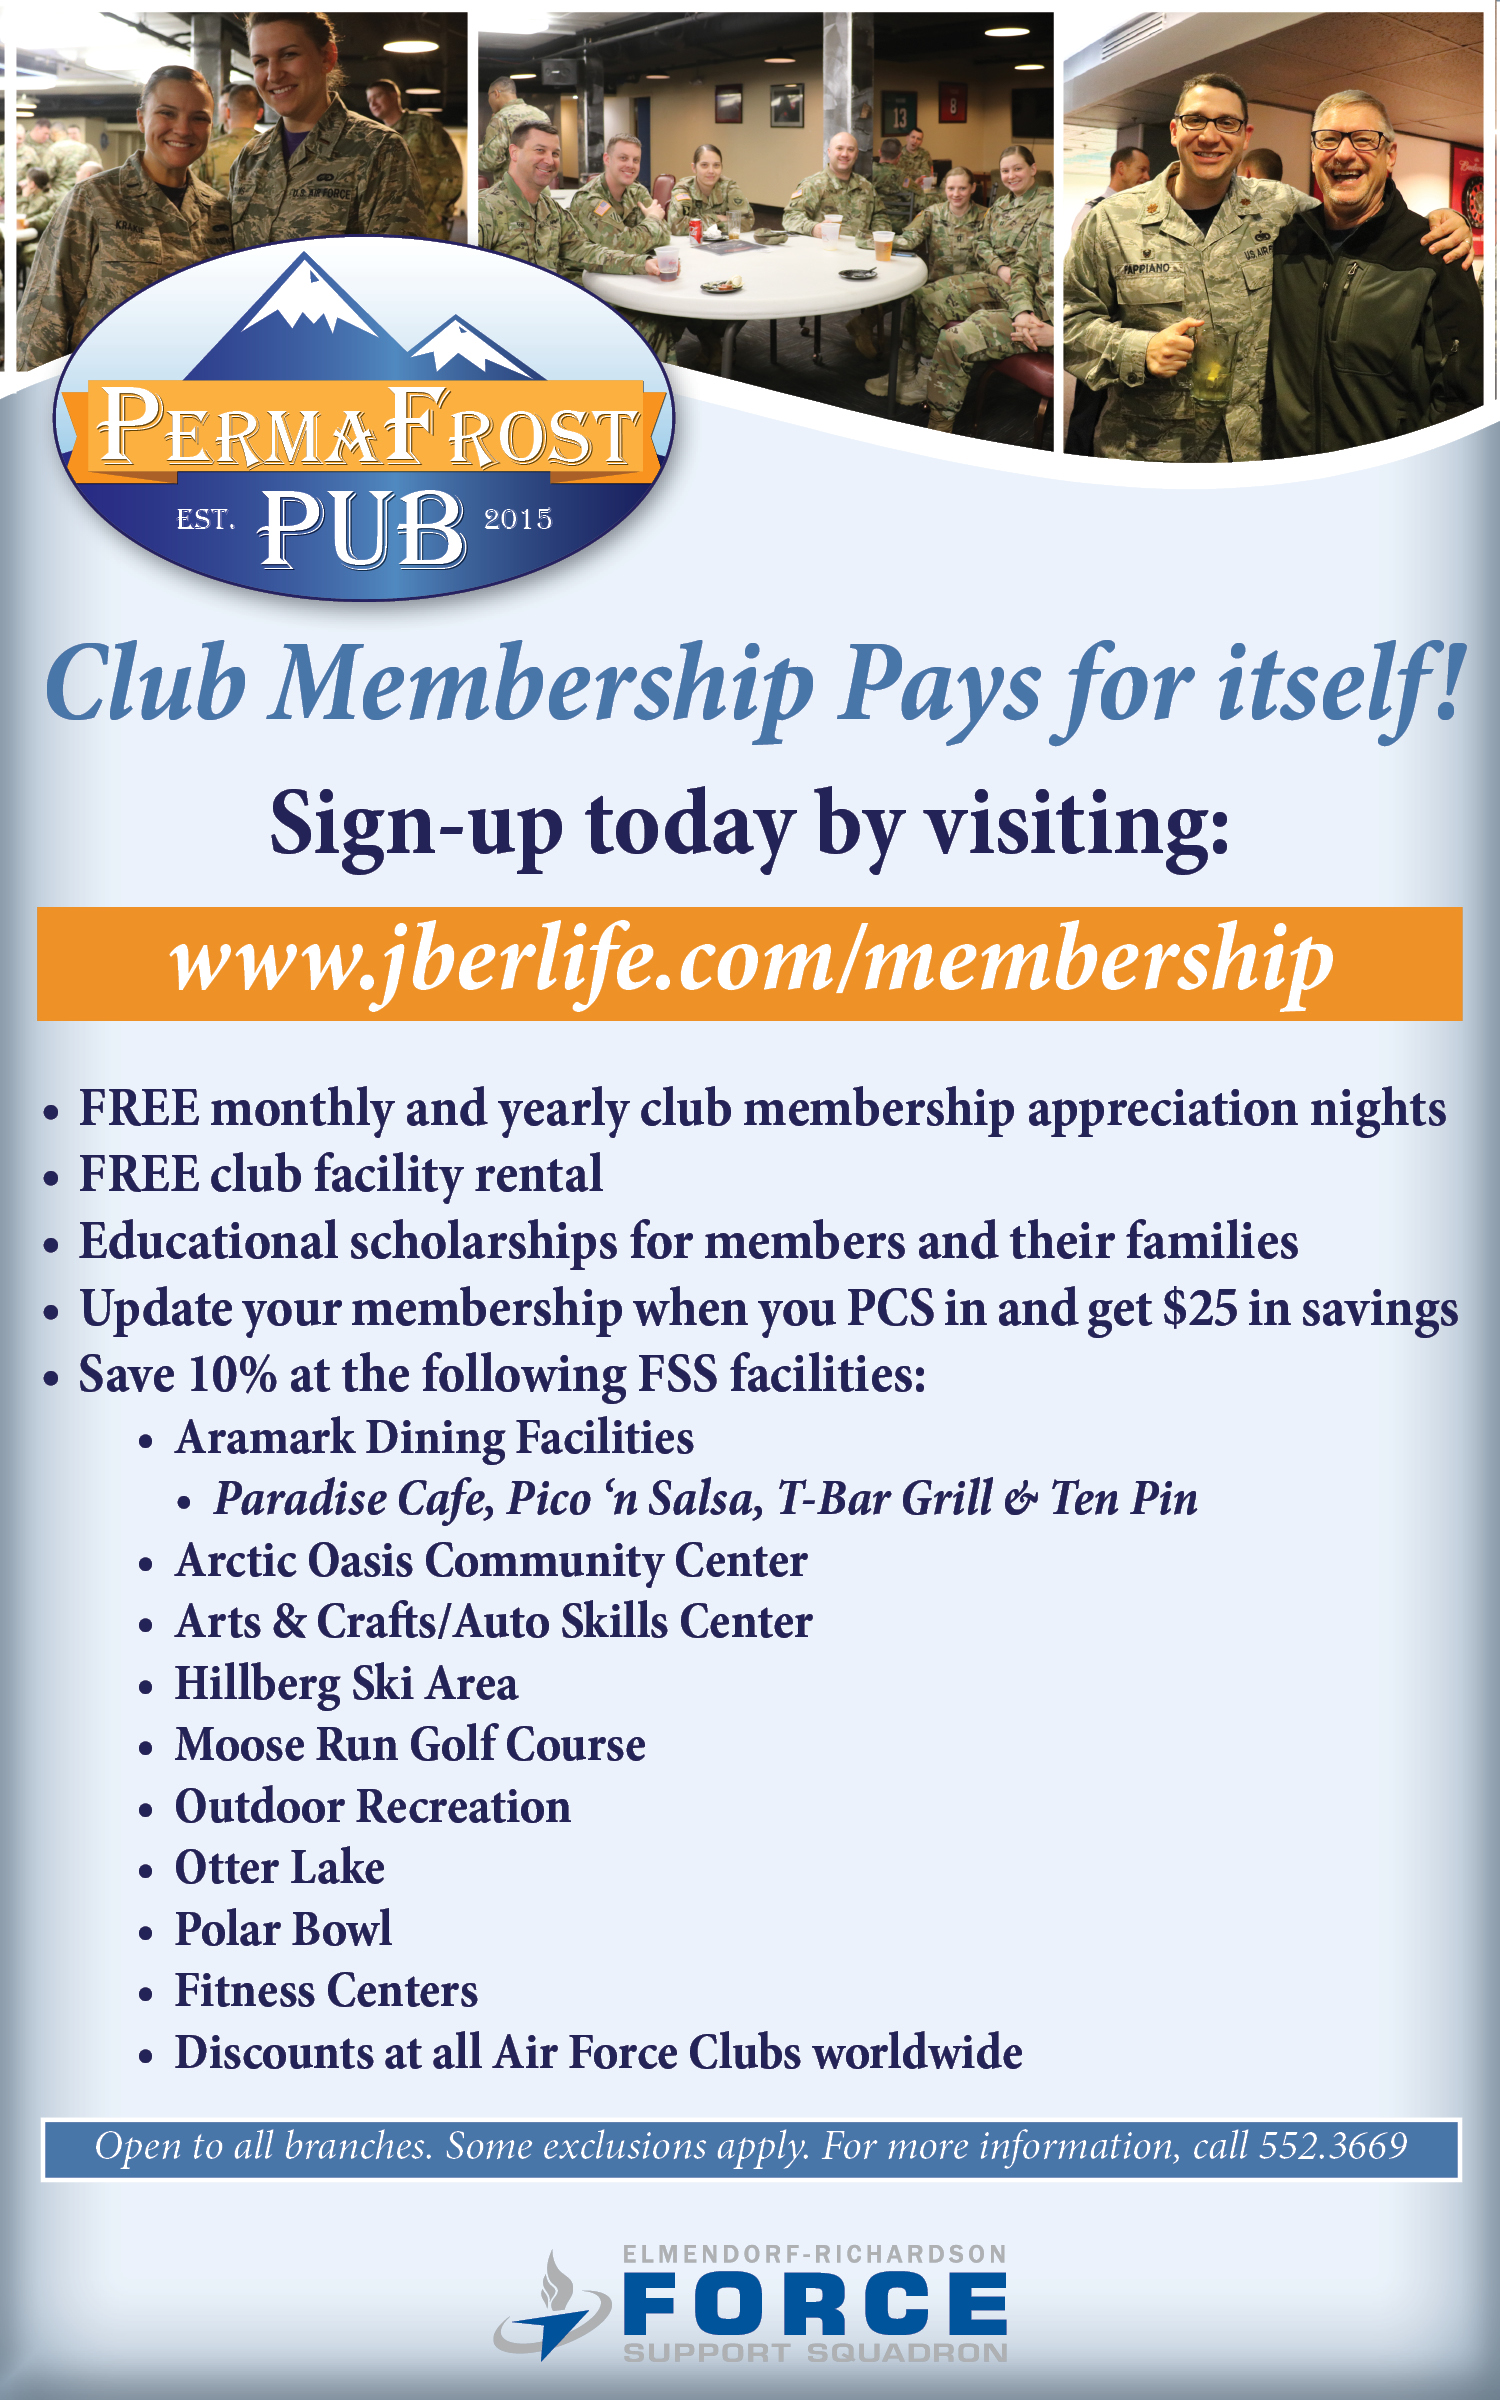 2018 Club Membership